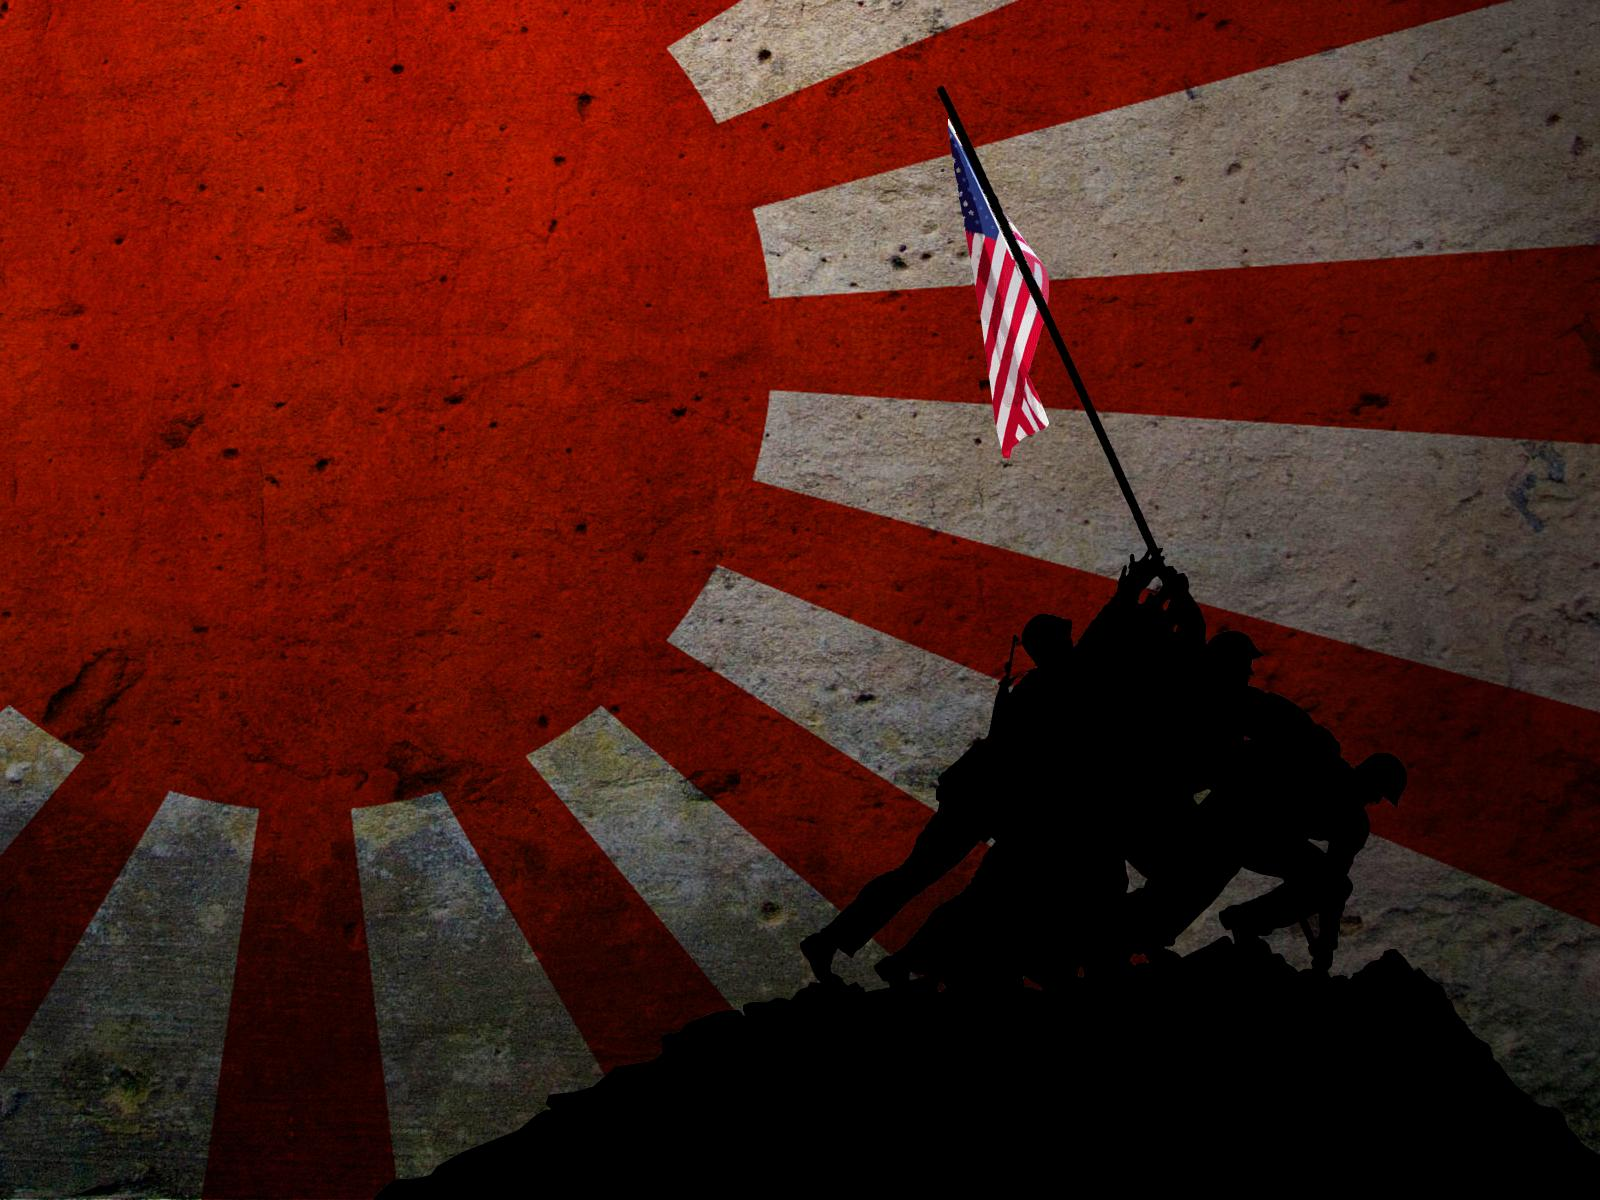 Usmc Flag Wallpapers Top Free Usmc Flag Backgrounds